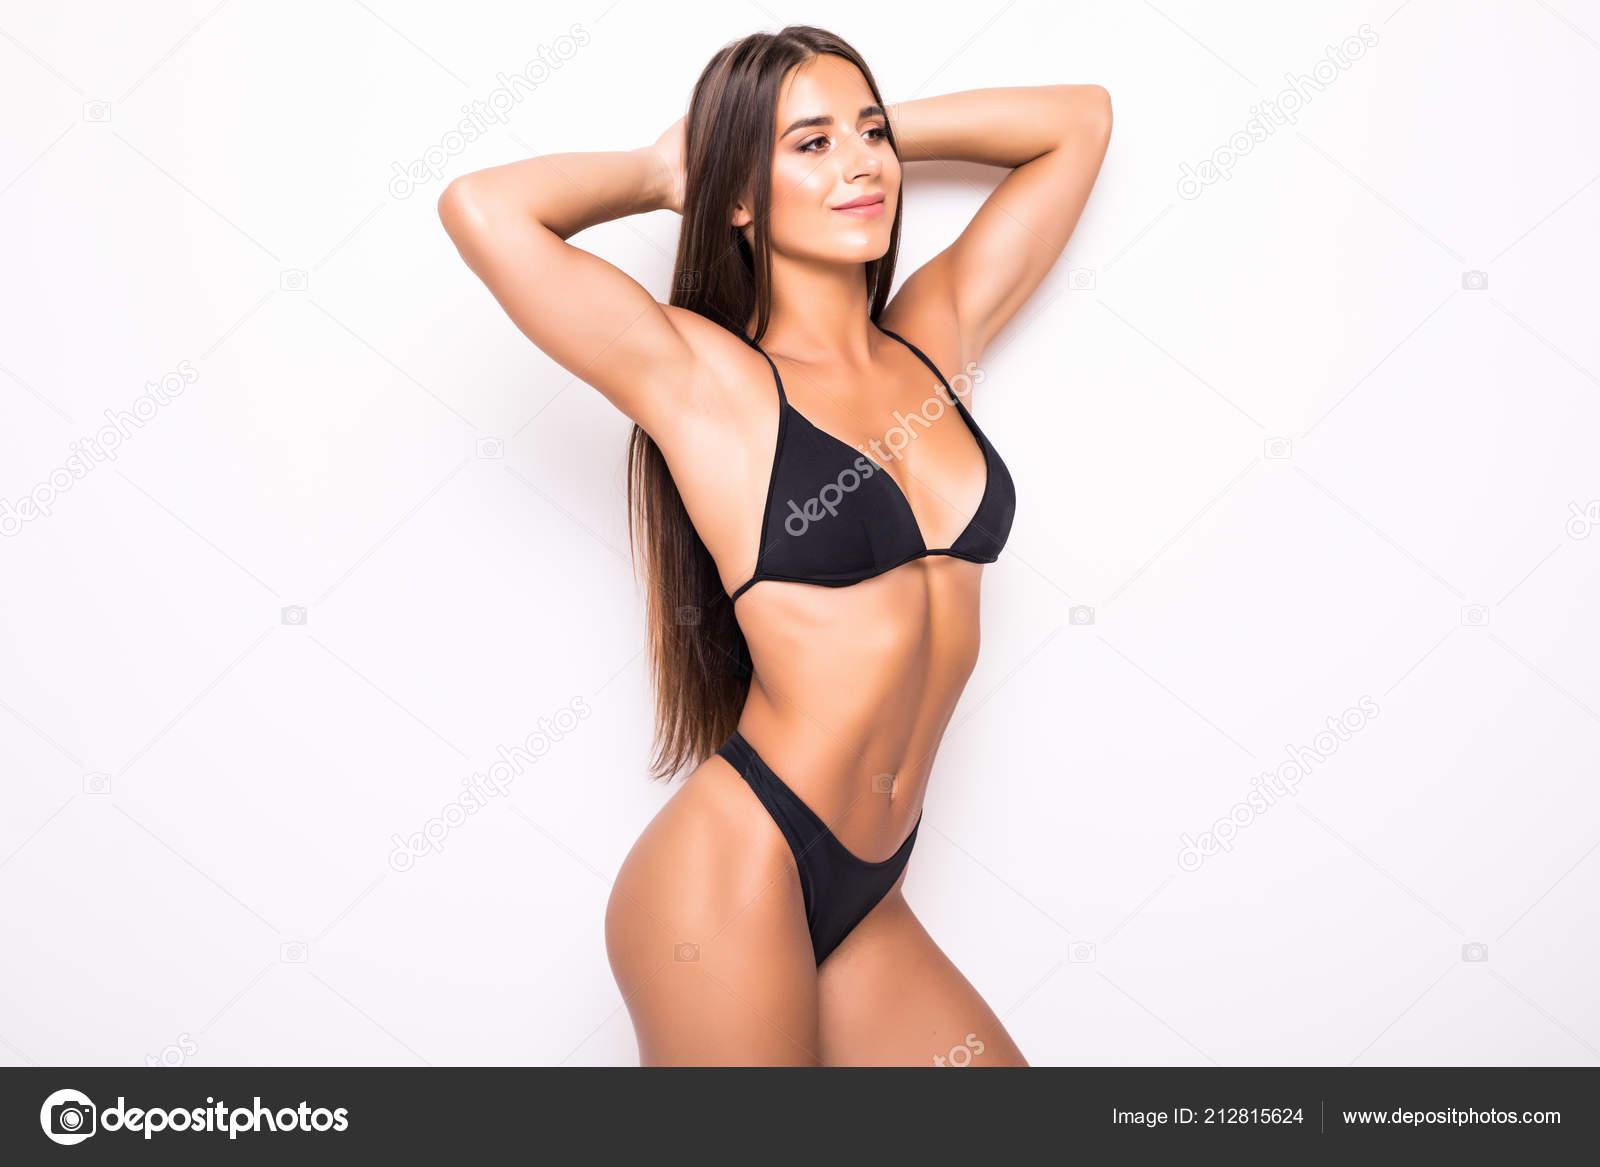 c457ebc75ee10 Slim body of young woman in black bikini. Girl with healthy sporty figure  isolated on white background — Photo by dan.grytsku.gmail.com| ...